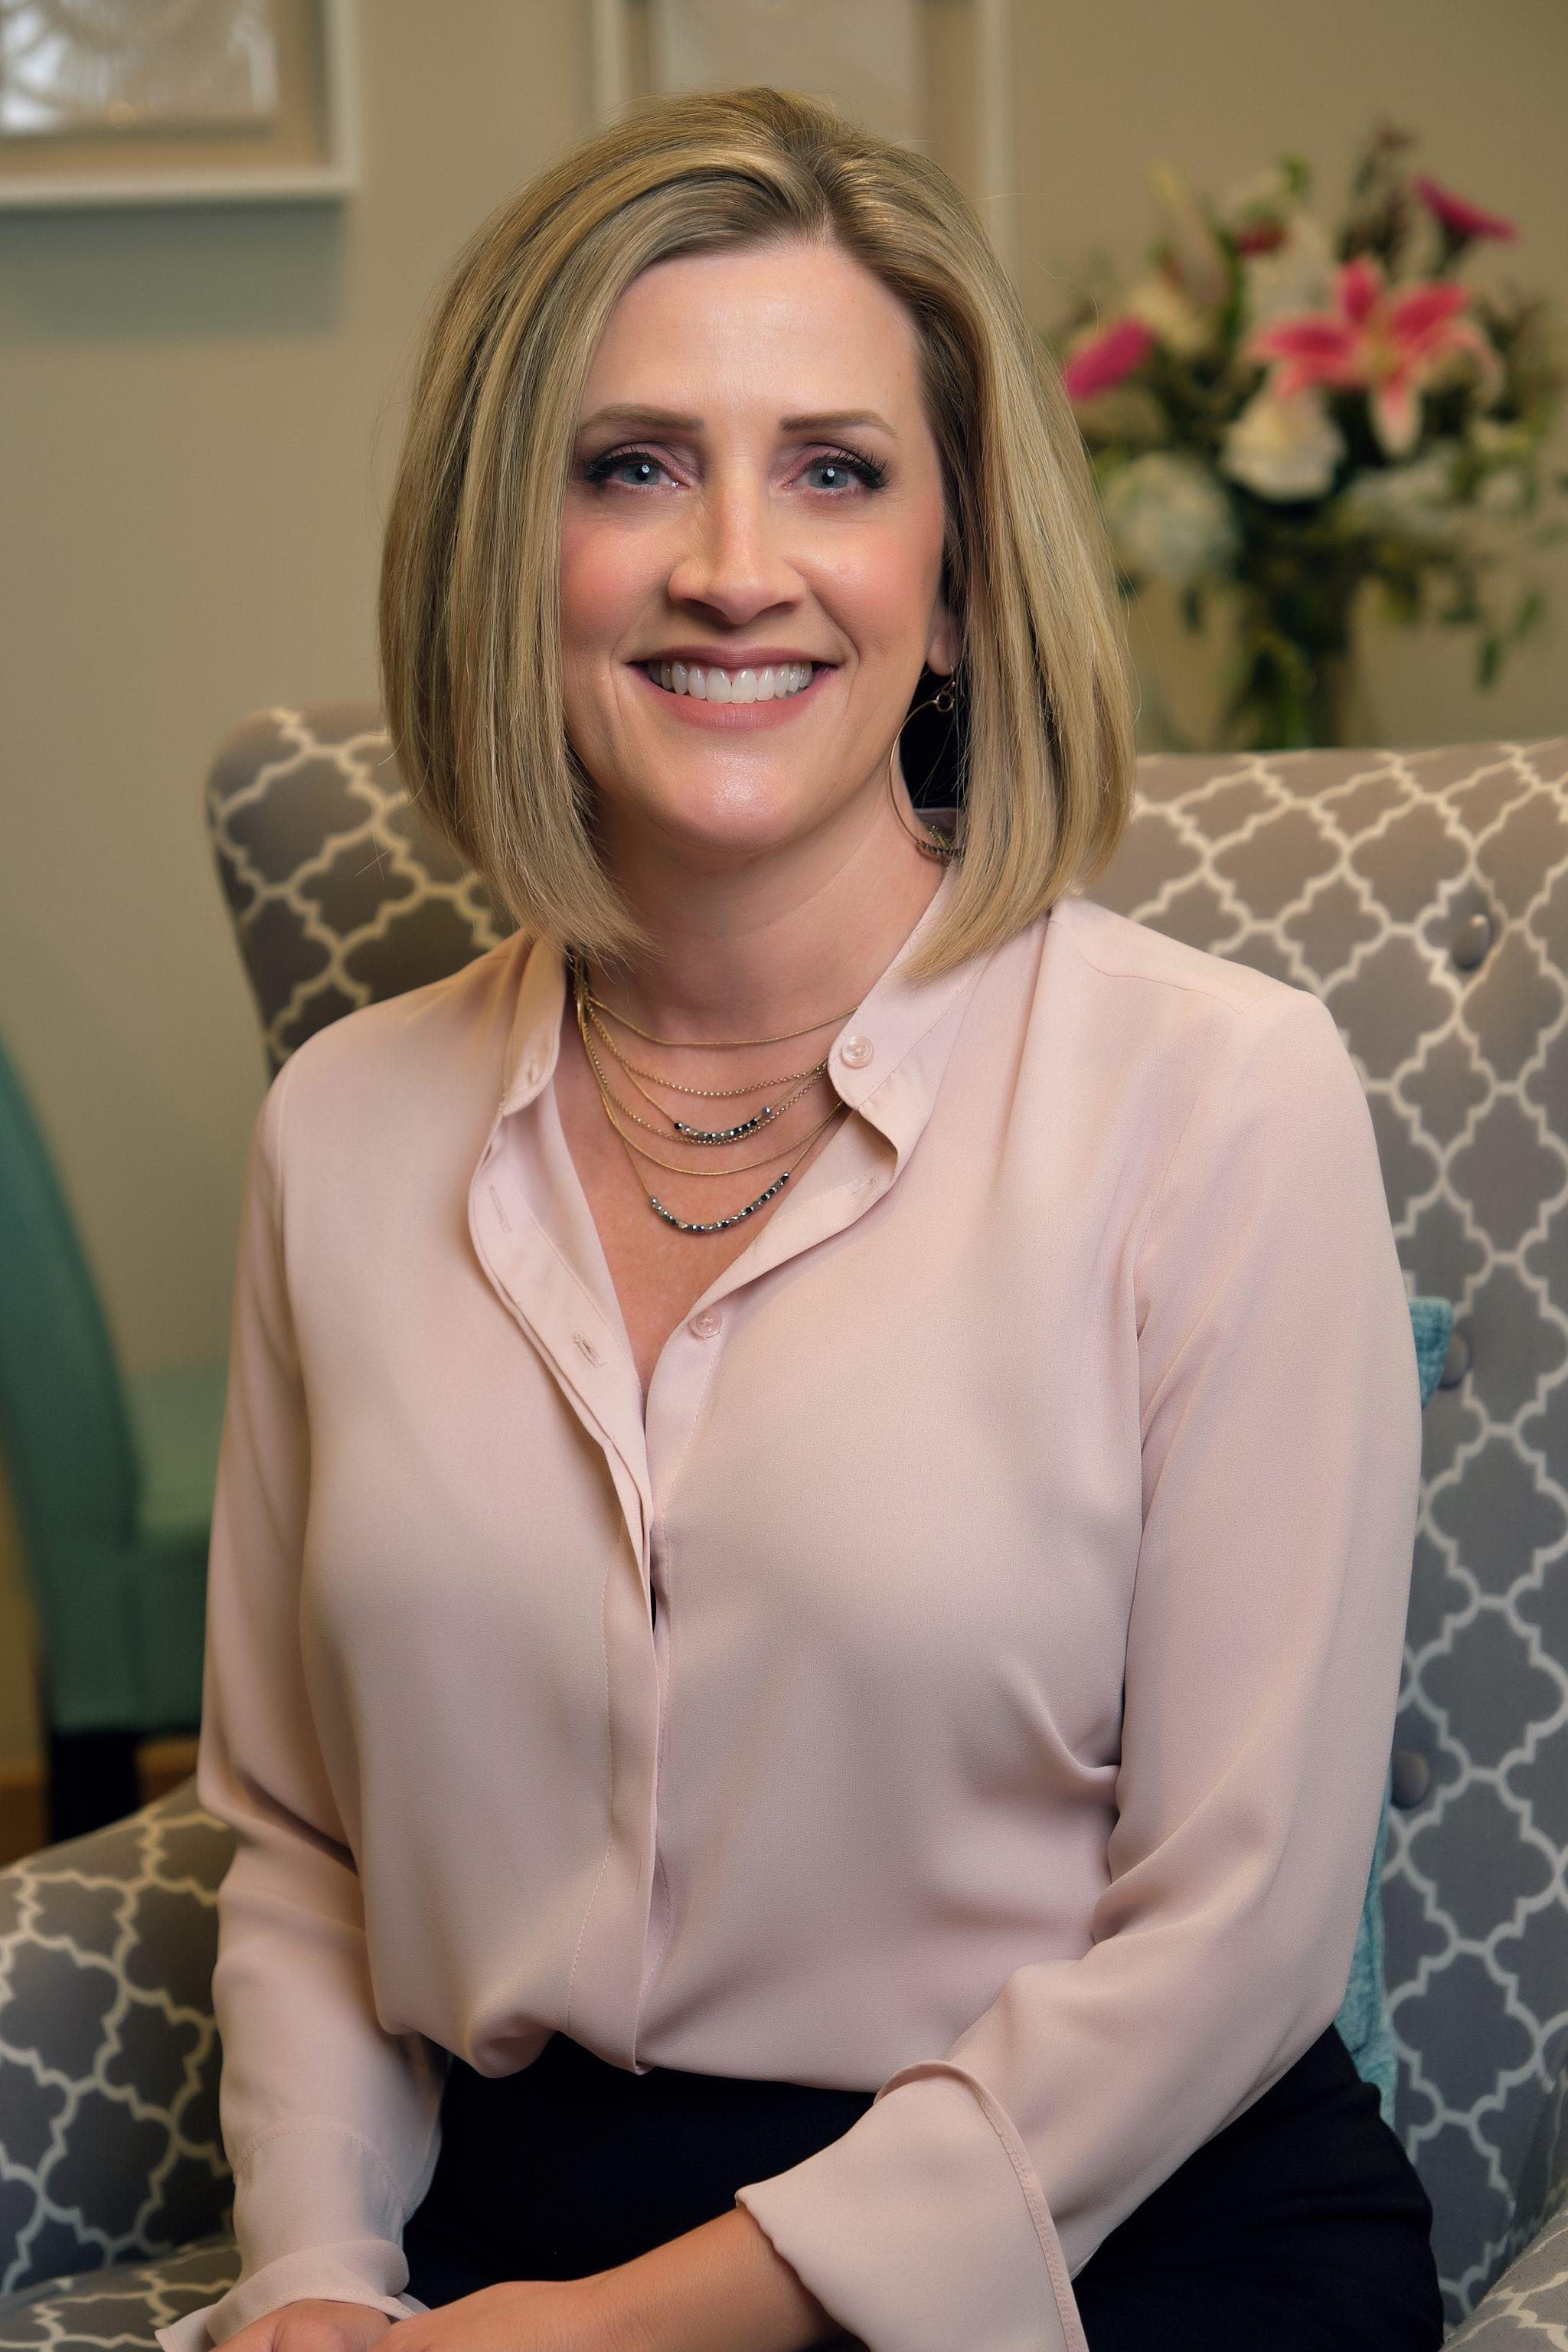 Kristine L. Jarrell AuD : Audiologist / Practice Owner